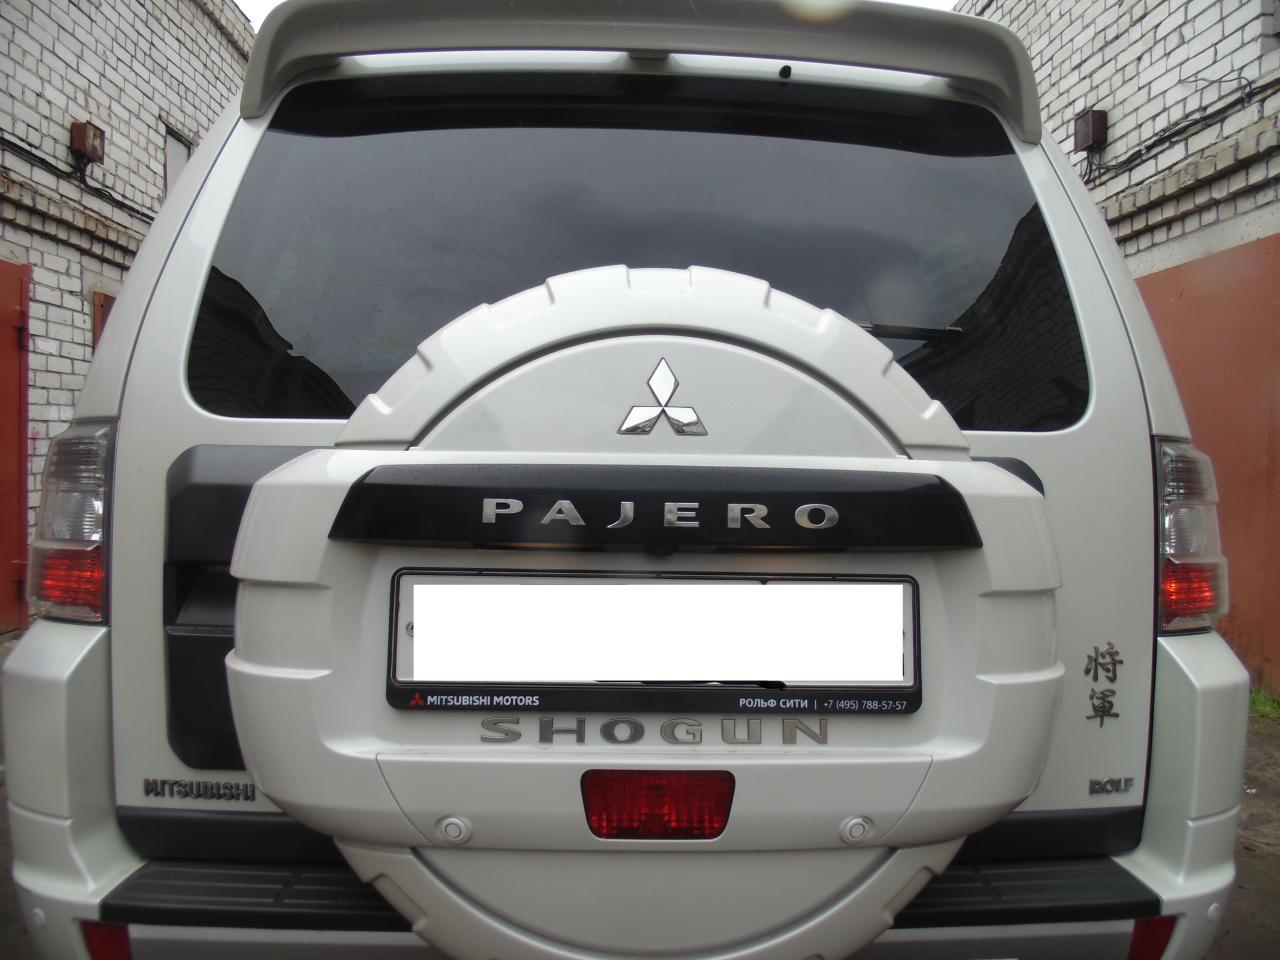 Mitsubishi Pajero 2012 г.в. г.Архангельск - фото 2